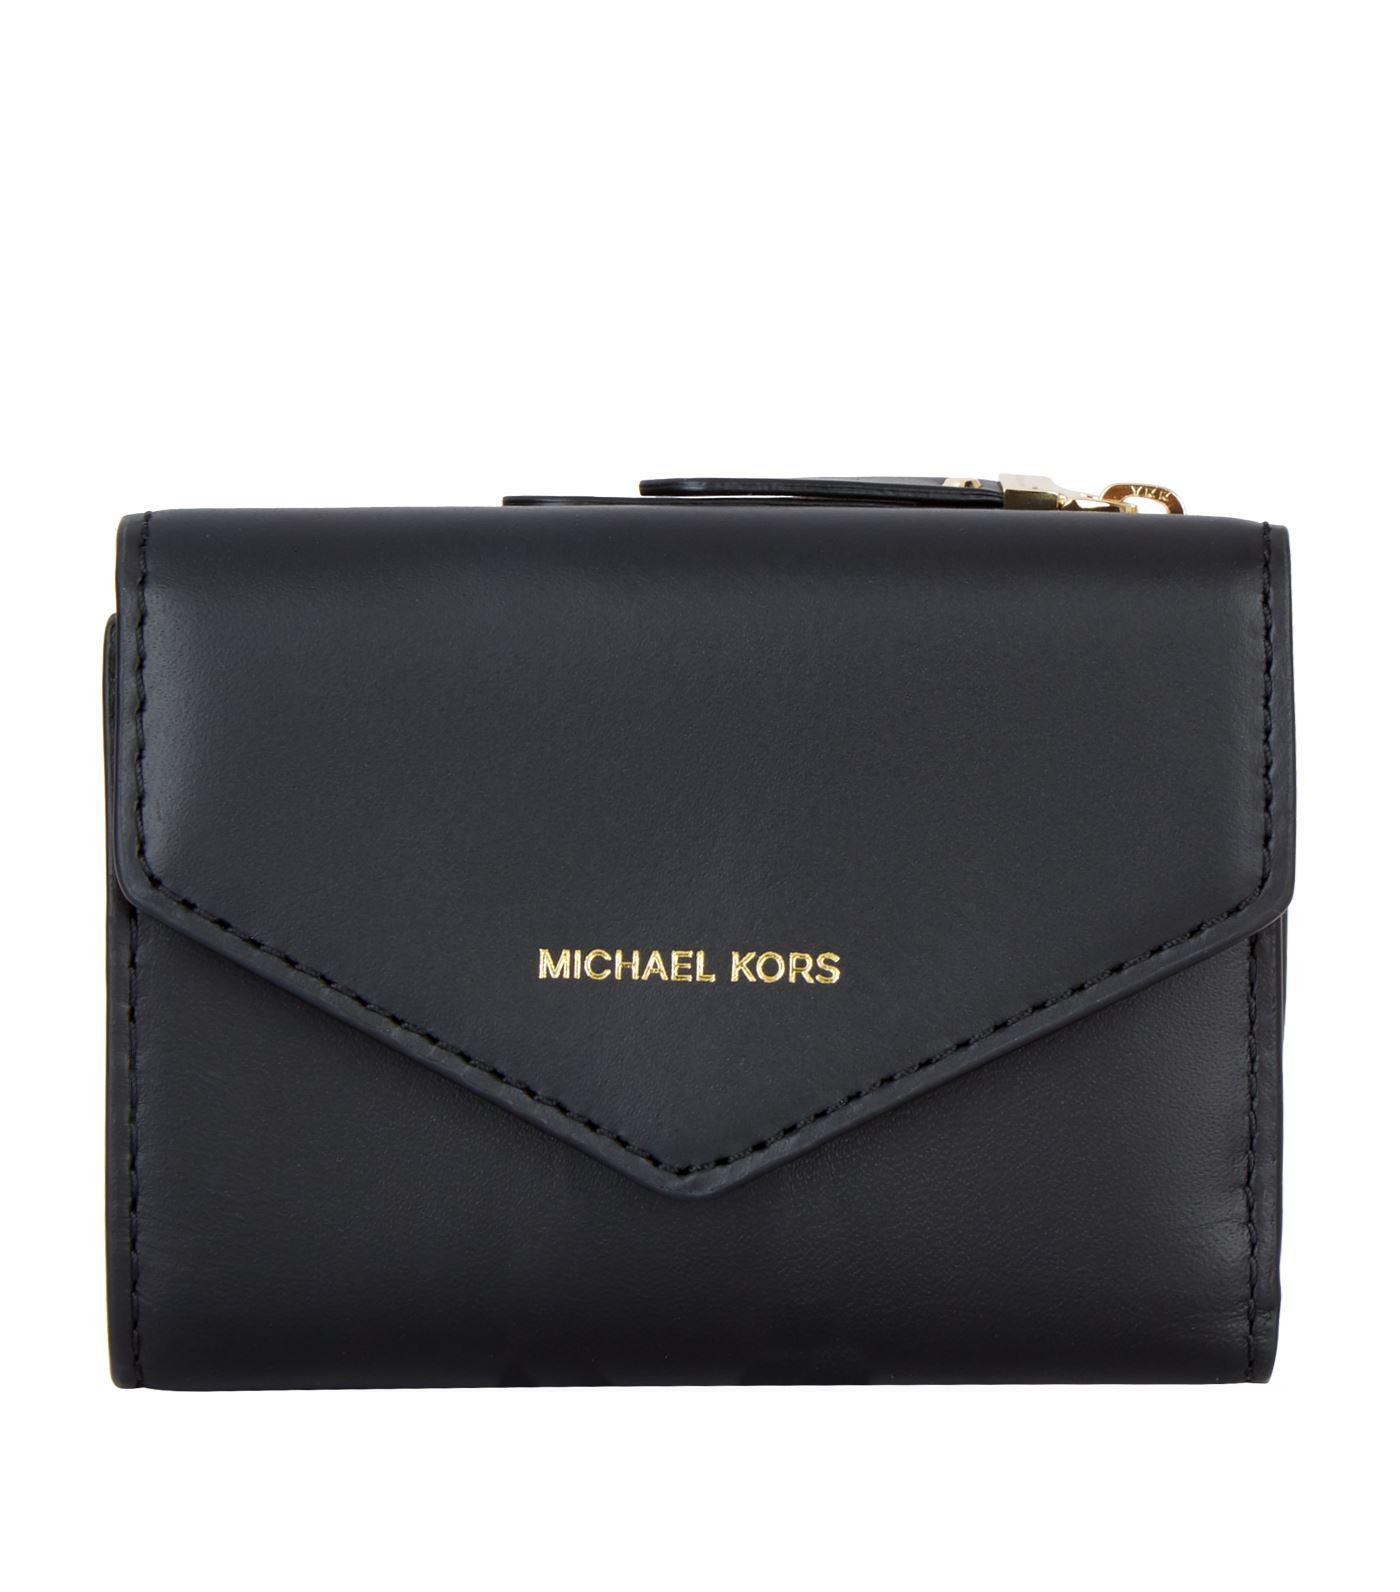 74abbce42aaec MICHAEL Michael Kors. Women s Black Small Leather Jet Set Envelope Wallet